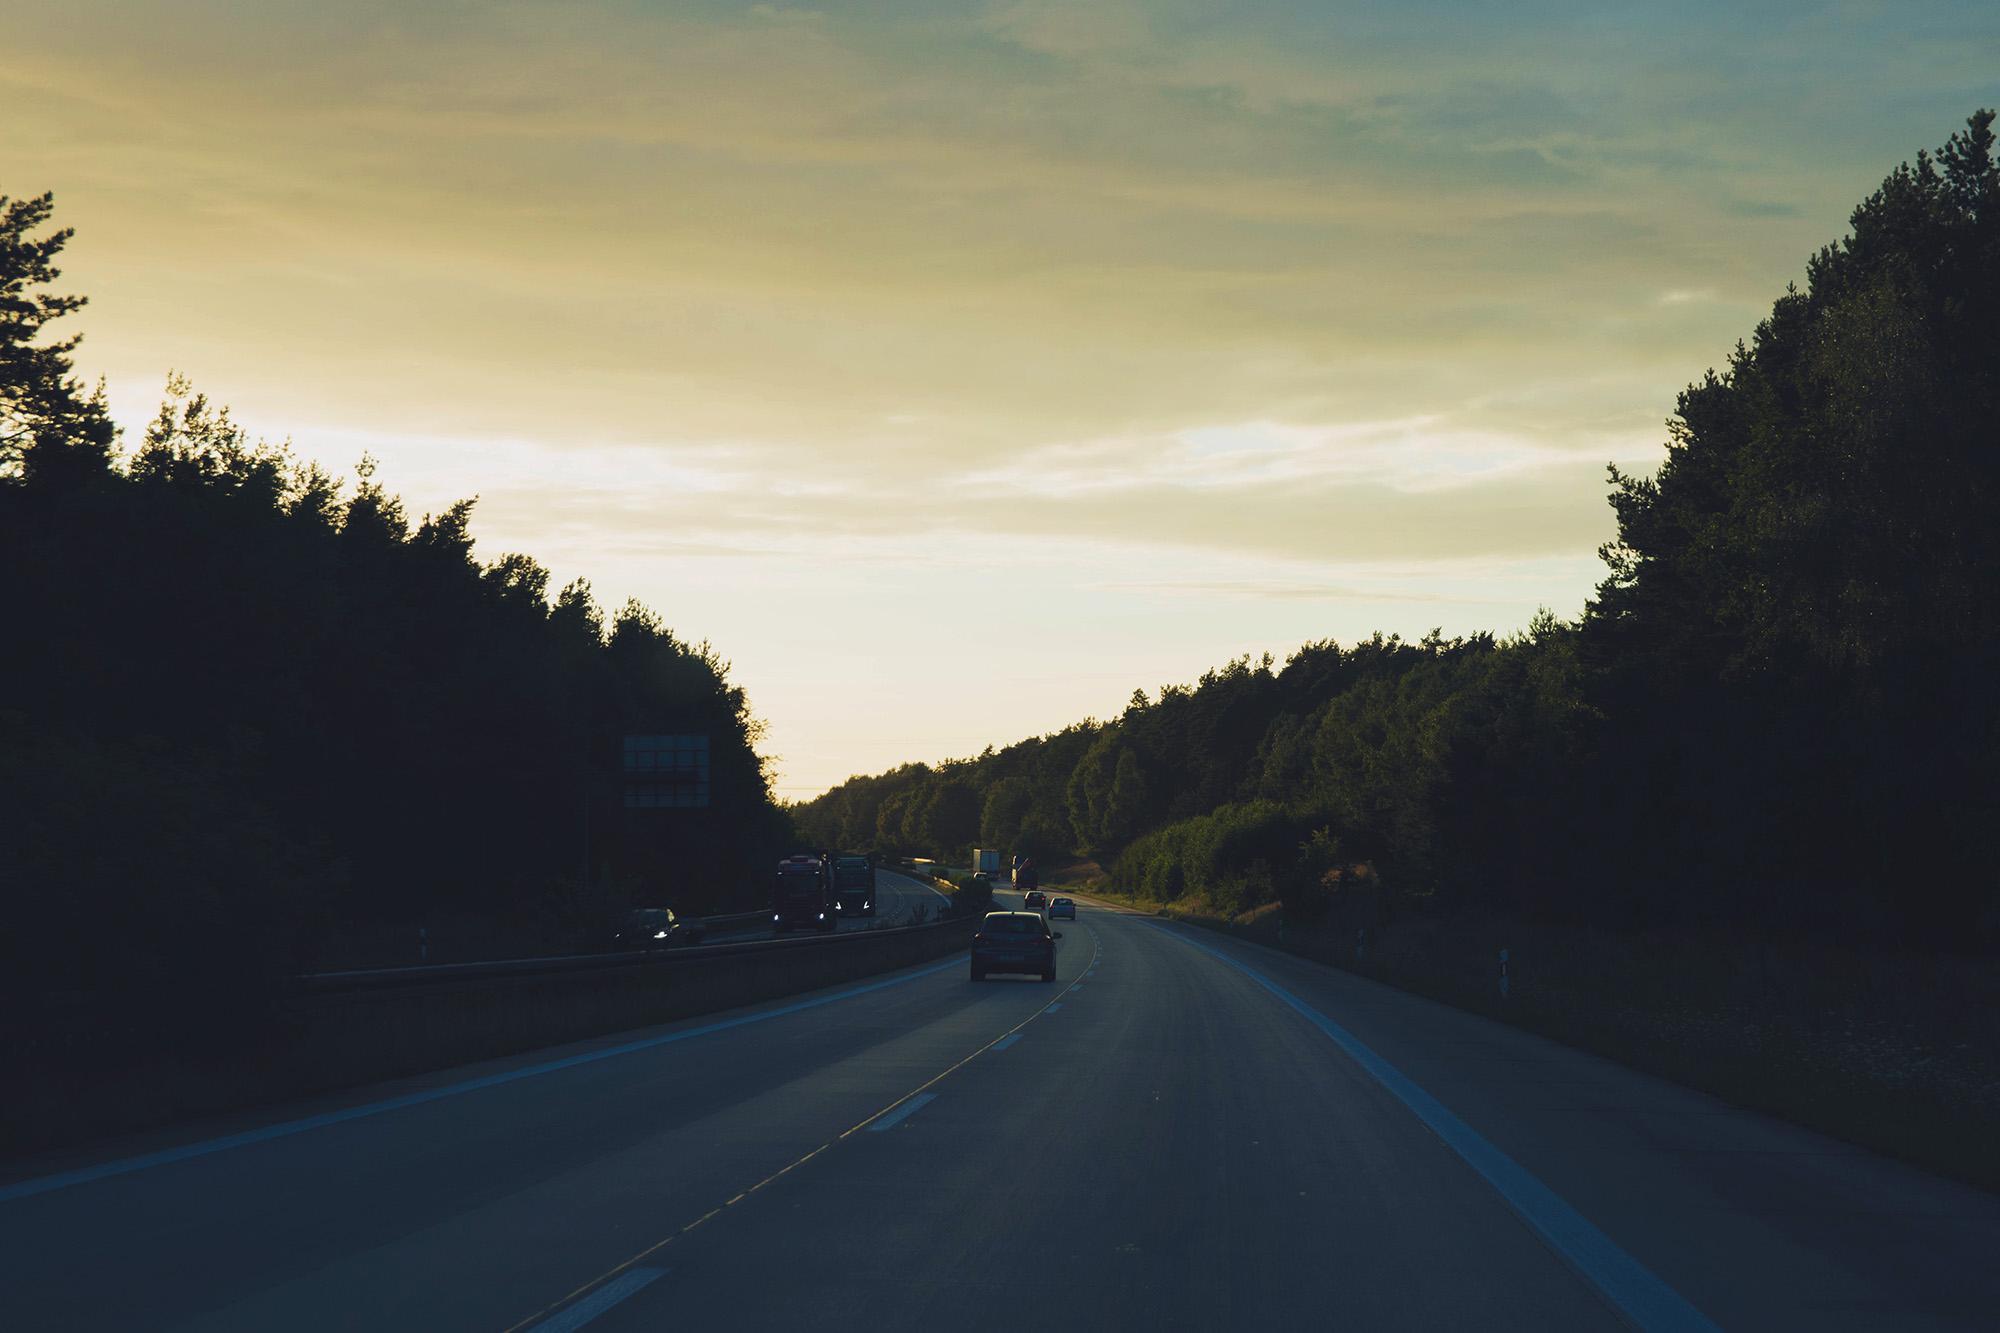 Germany motorway sunset